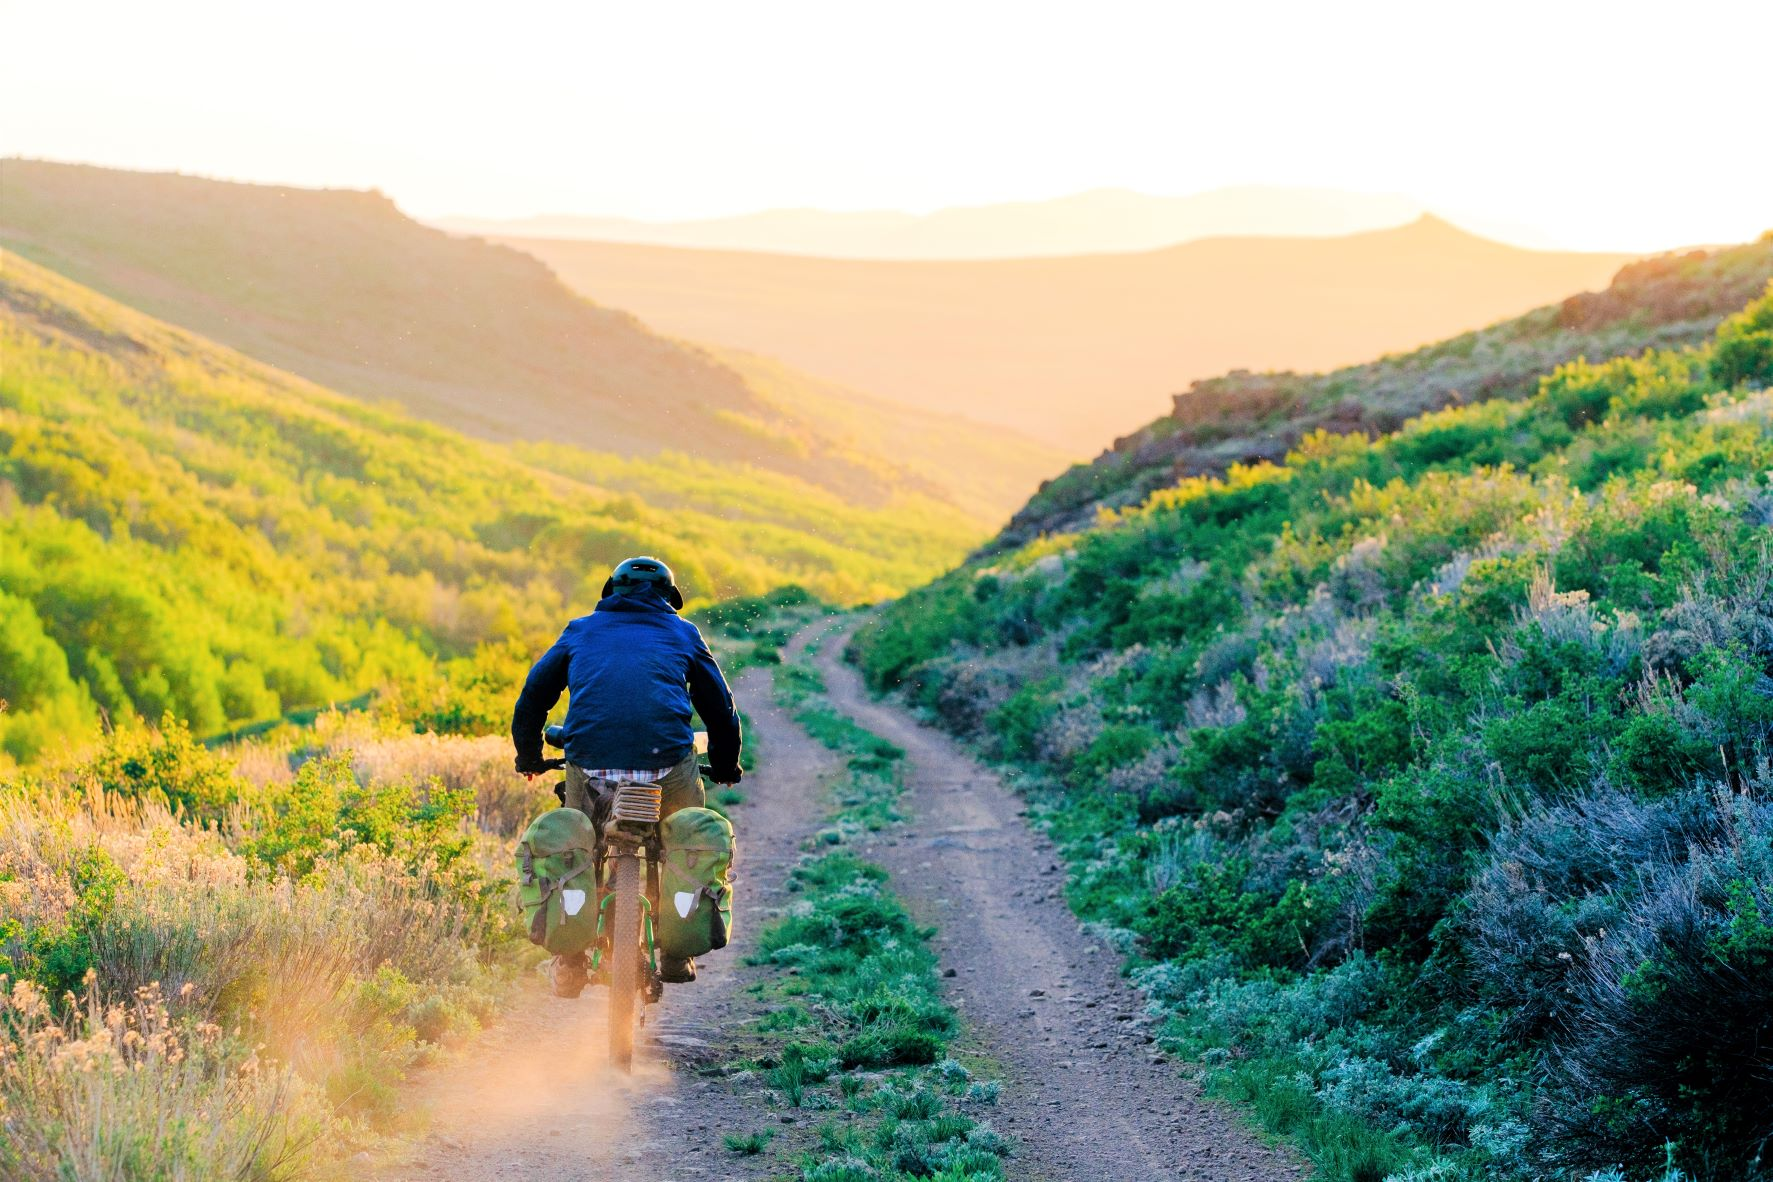 Bikepack riding a gravel road on Oregon's Big Country Route, alongside sagebrush.